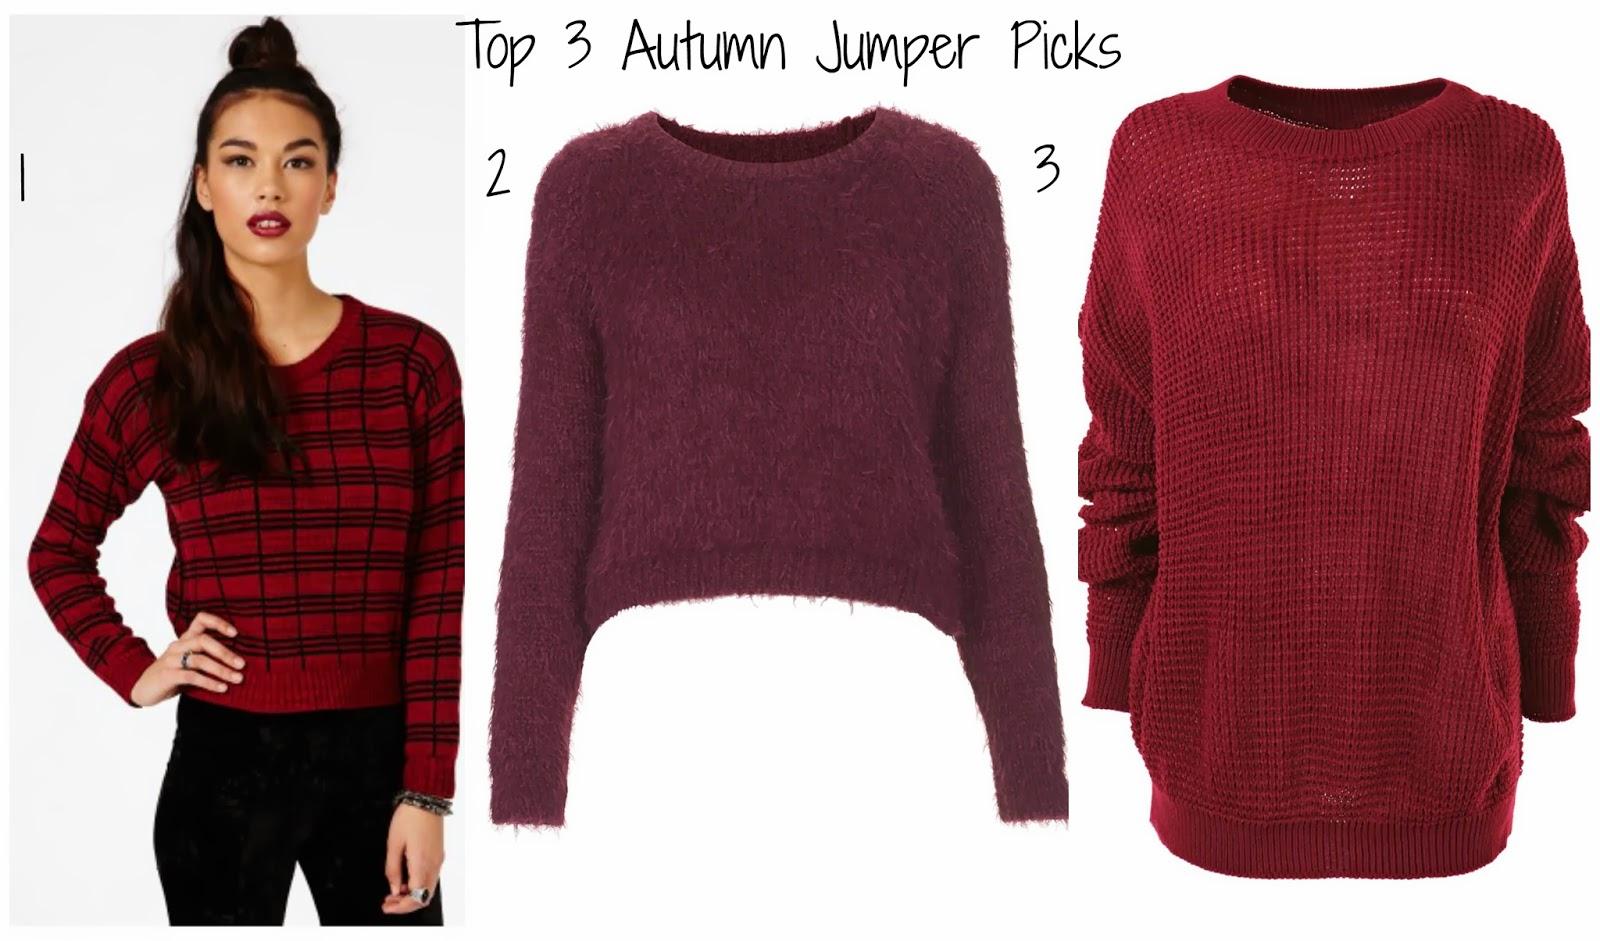 Top 3 Autumn Jumper Picks